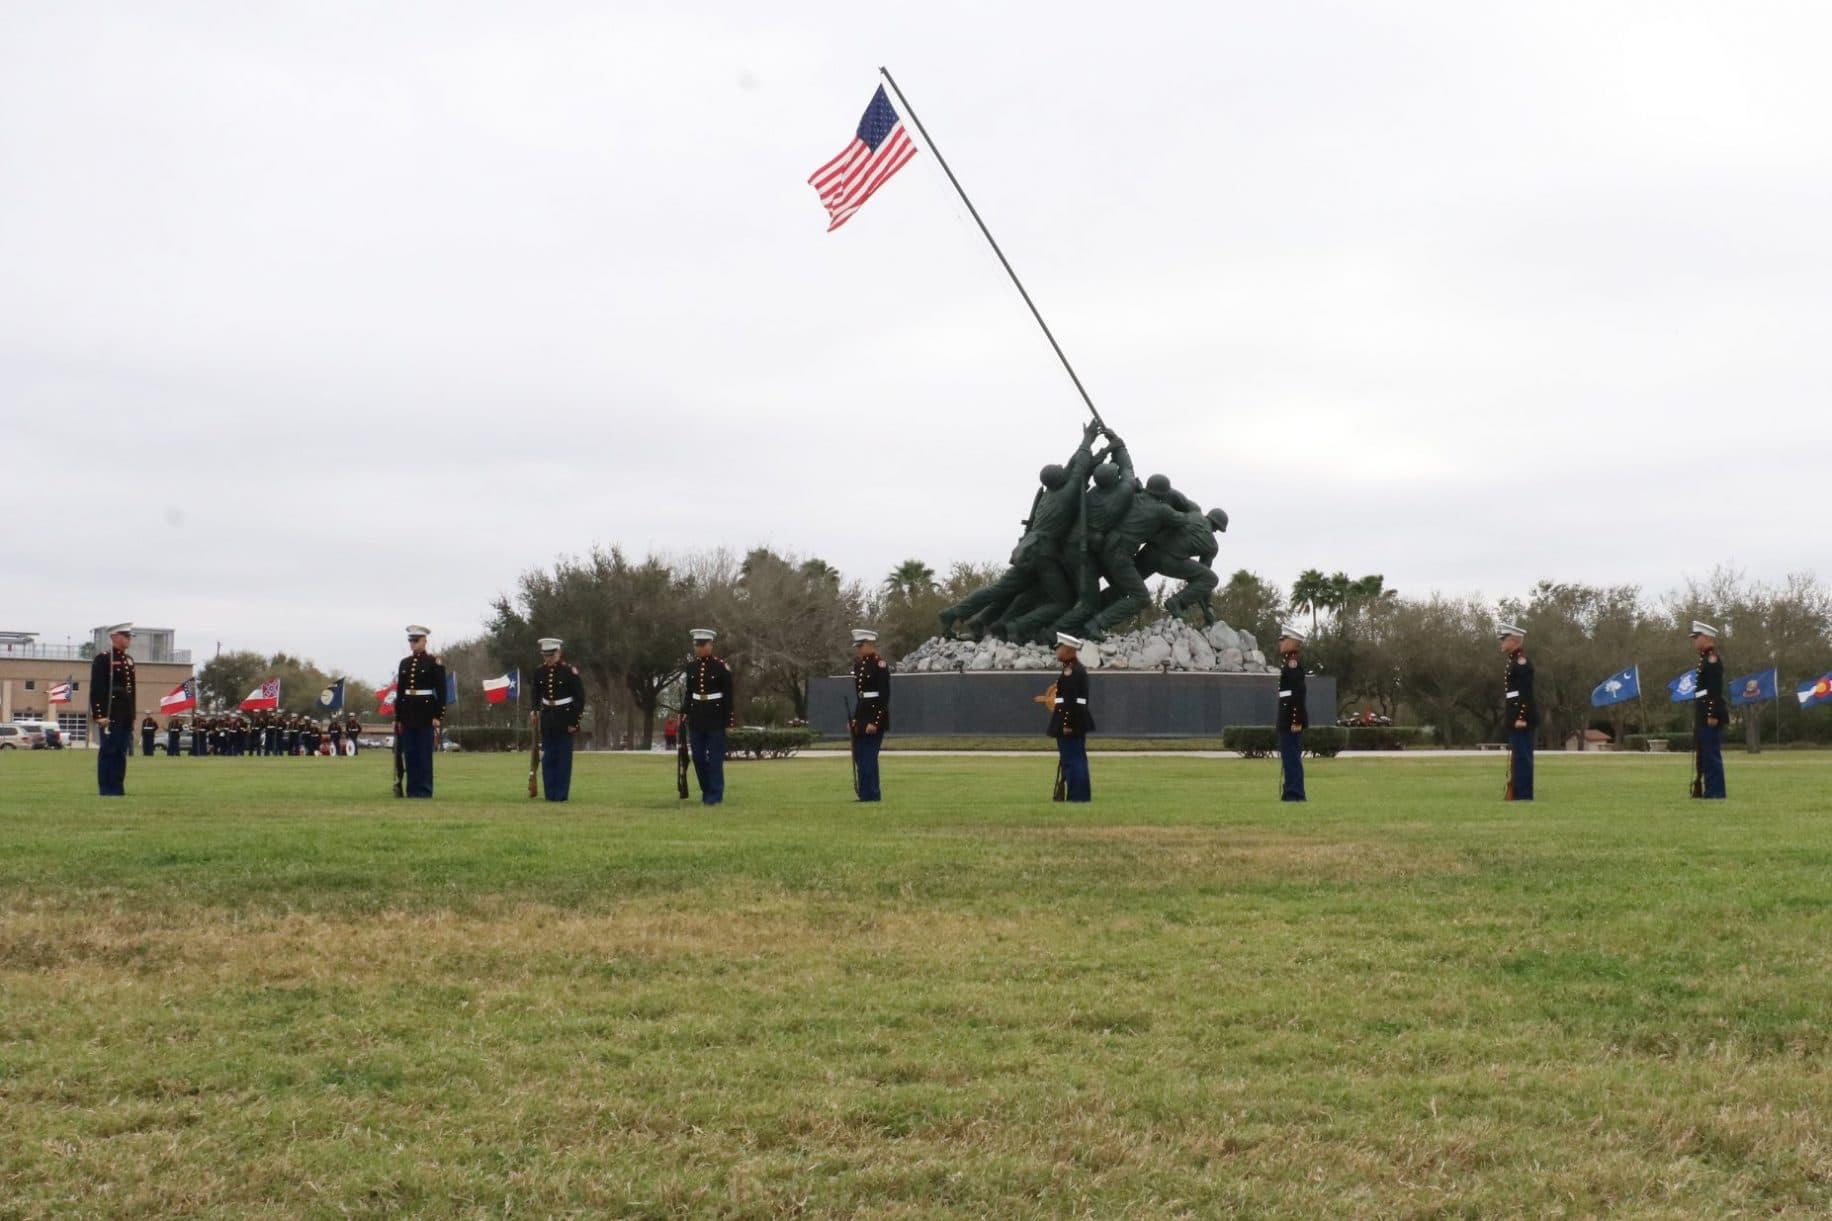 Marine Military Academy commemorates the 75th anniversary of the Battle of Iwo Jima